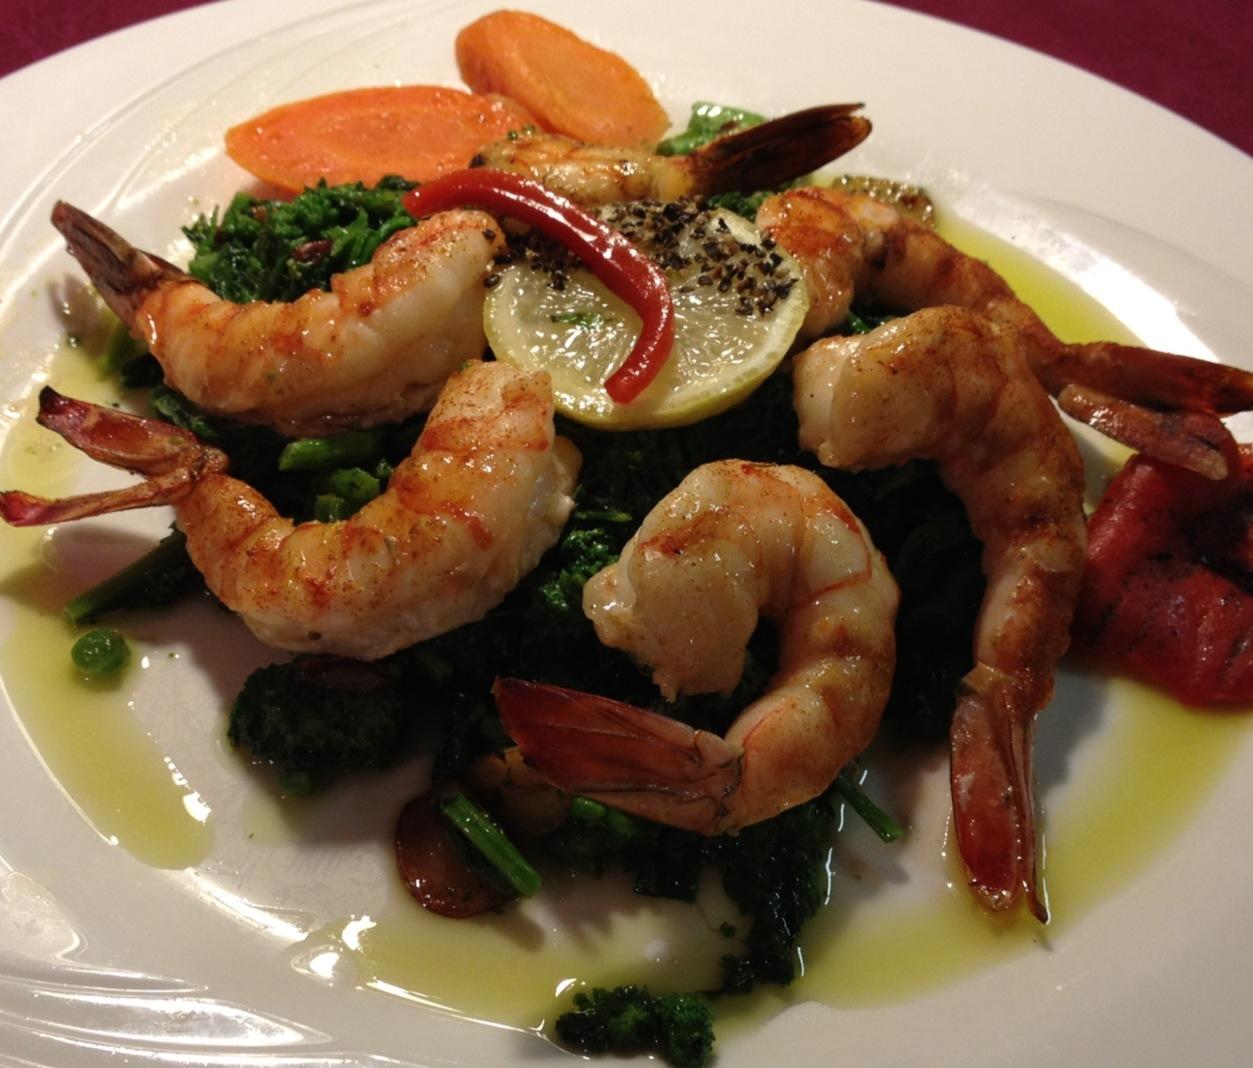 Baked Shrimp (6) with White Wine, Olive Oil and Lemon  over Sautéed Broccoli Rabe...Pepper Relish